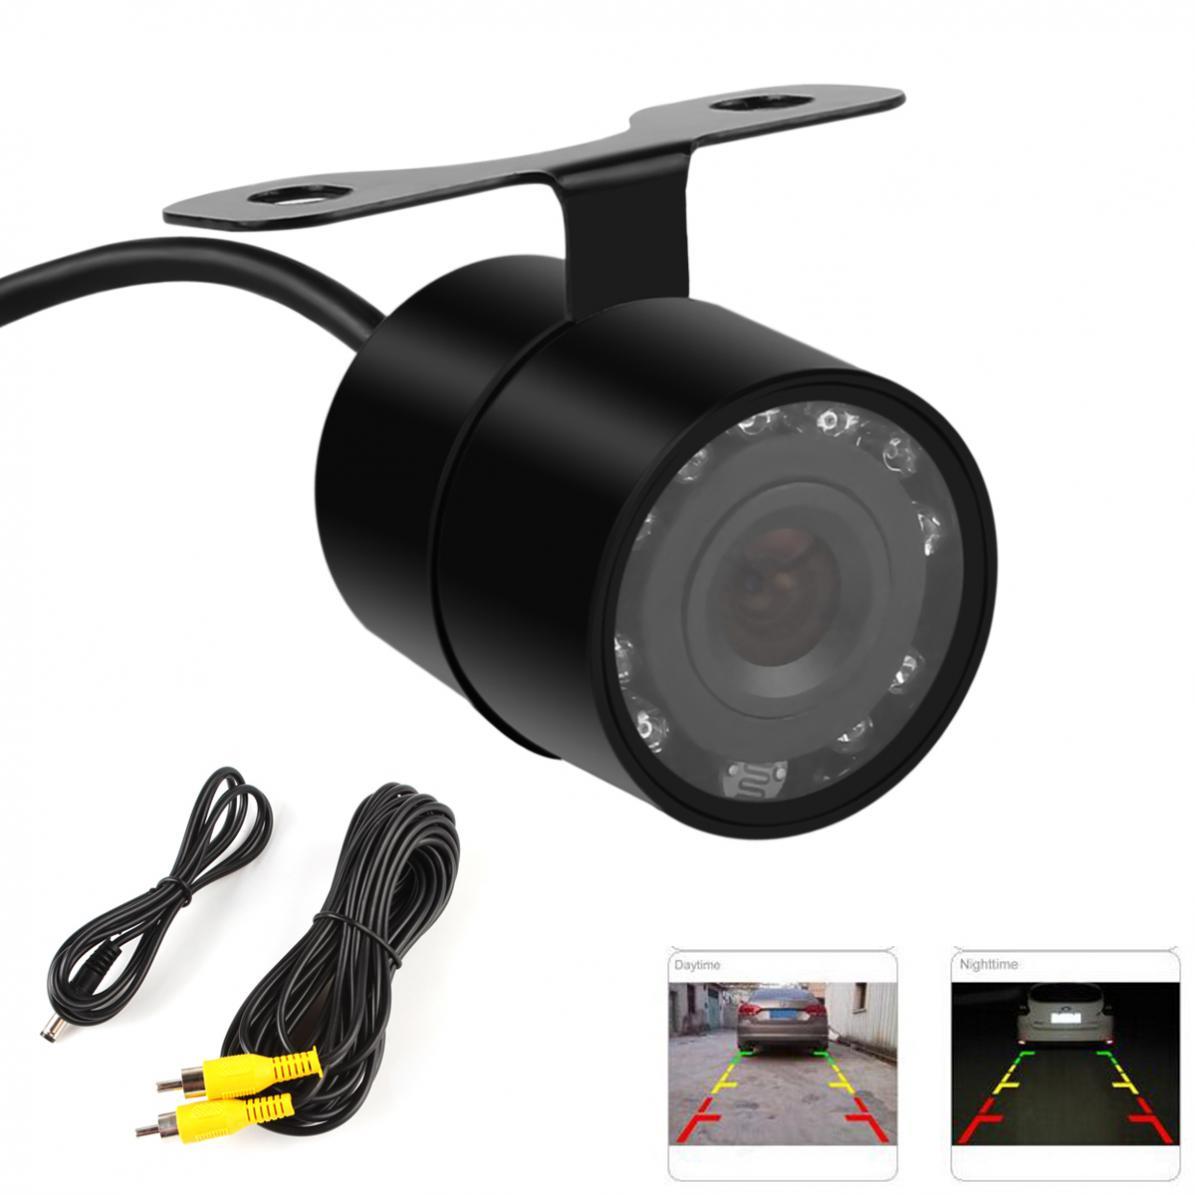 Car Rear View PC1030 420TVL IR Night Vision CMOS Camera 170 Degree Wide Angle Waterproof Auto Reversing Parking New